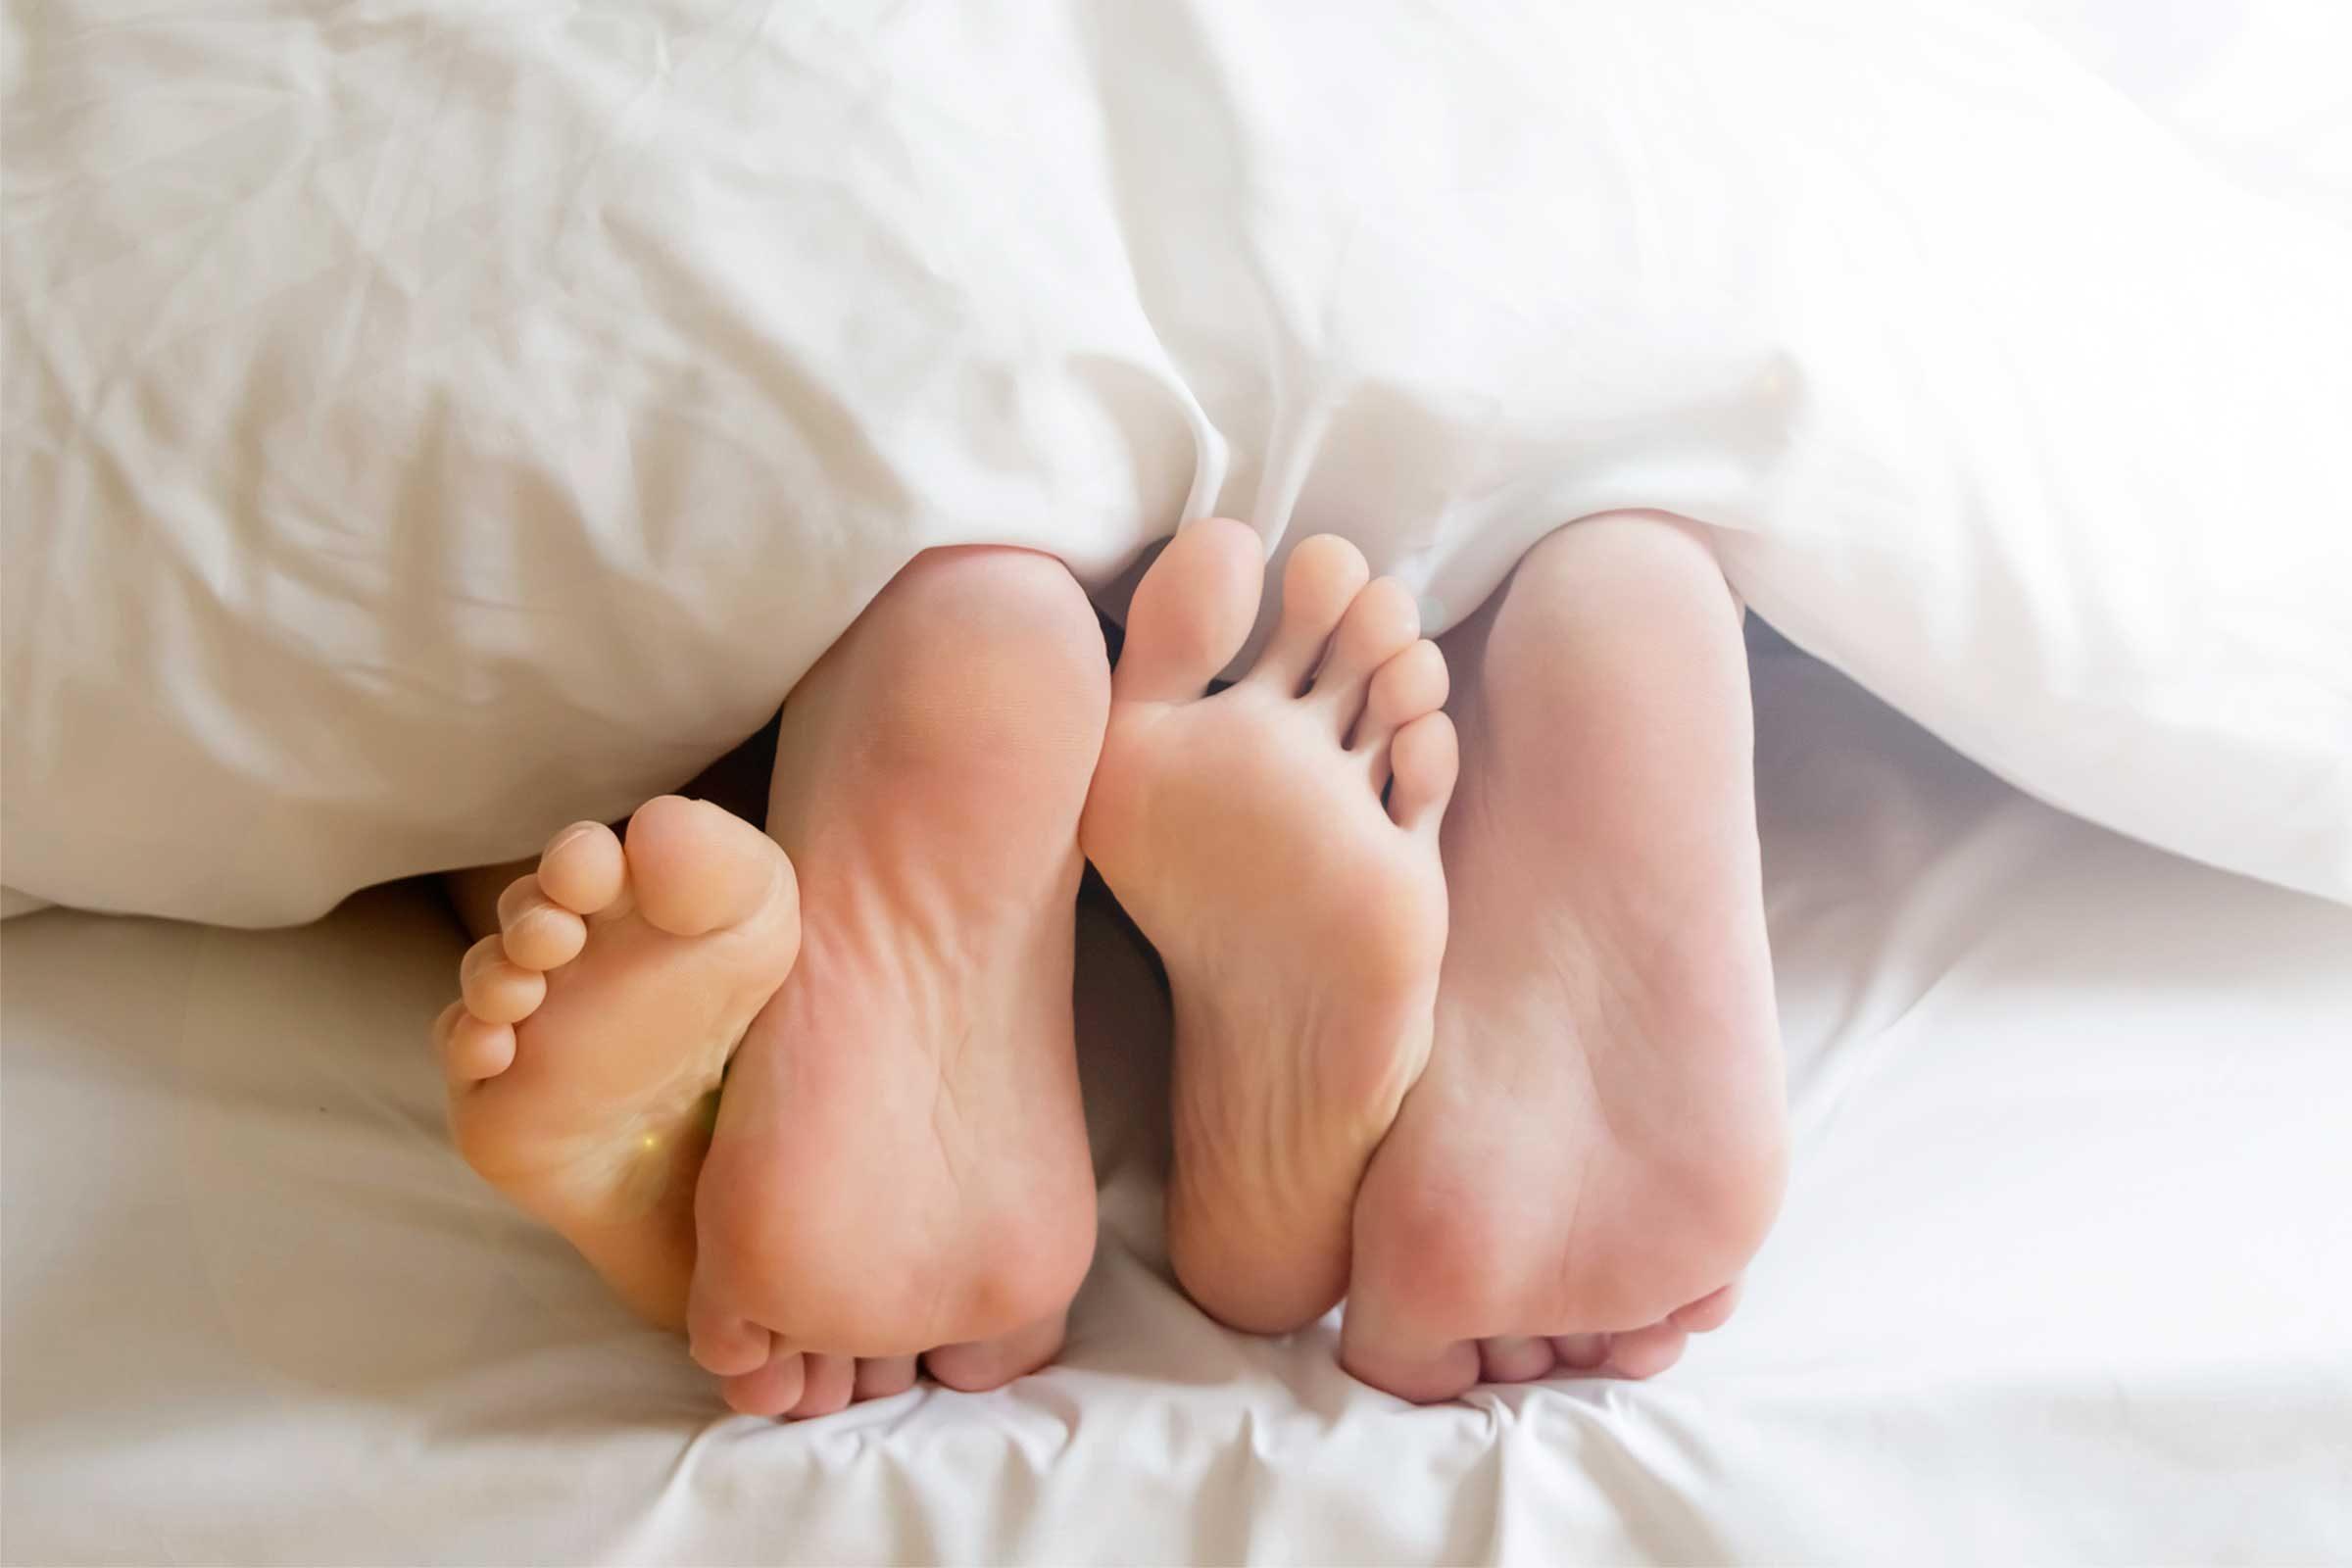 Hpv transmitted thru sex